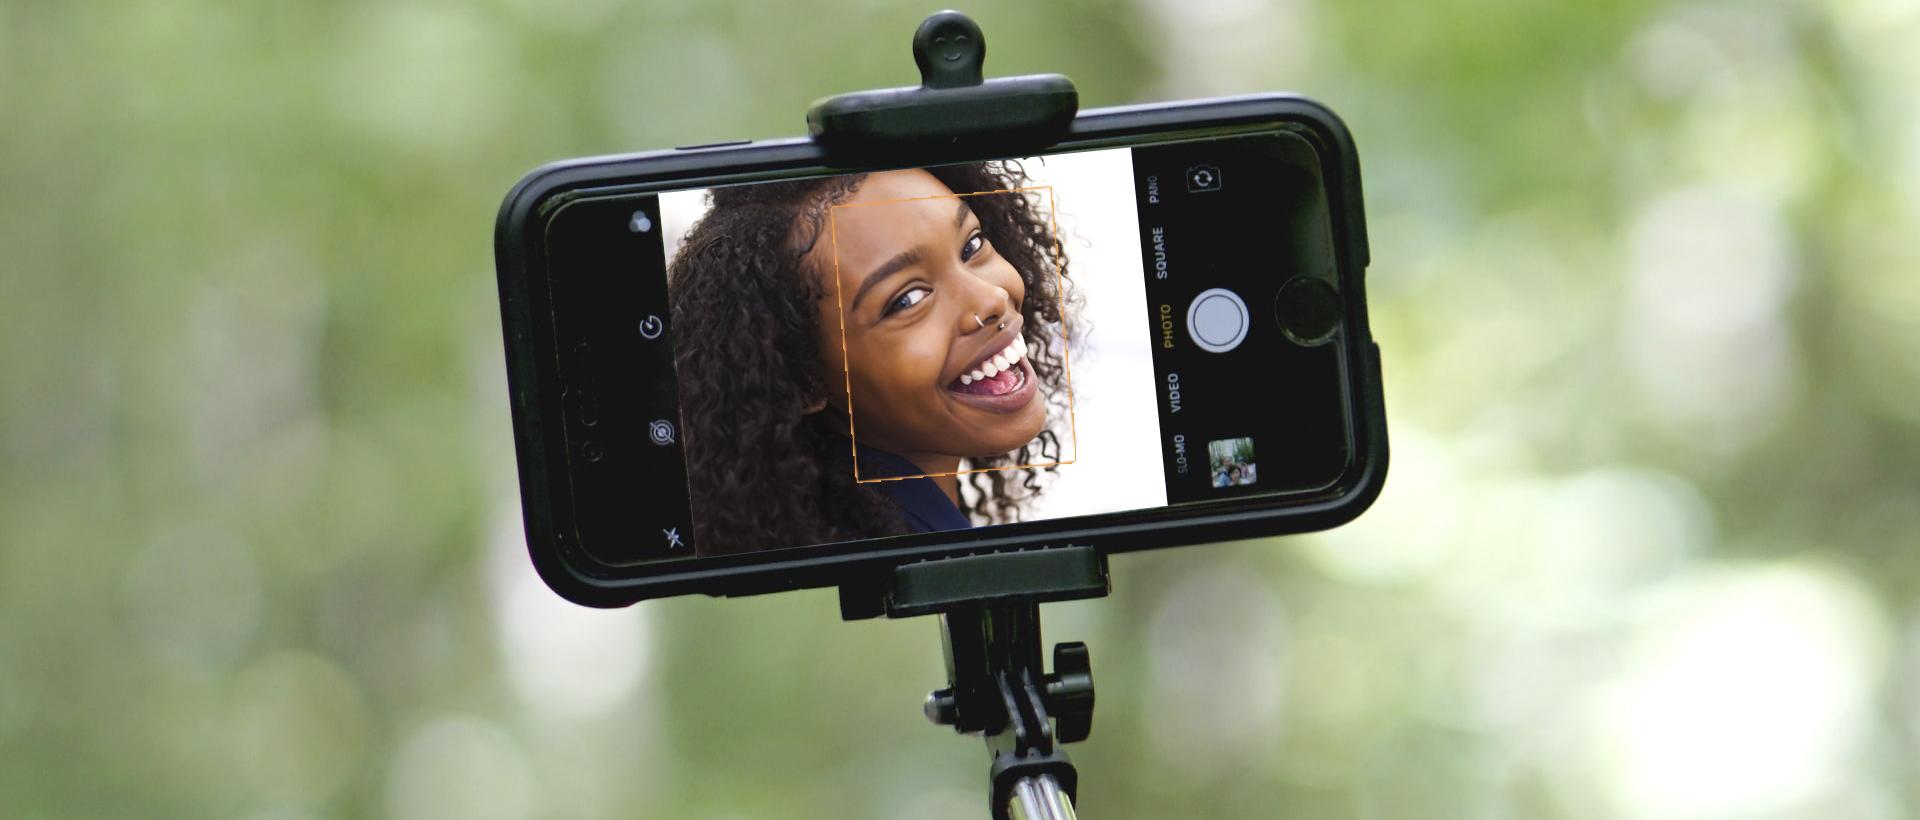 Selfie image - African woman on phone screen